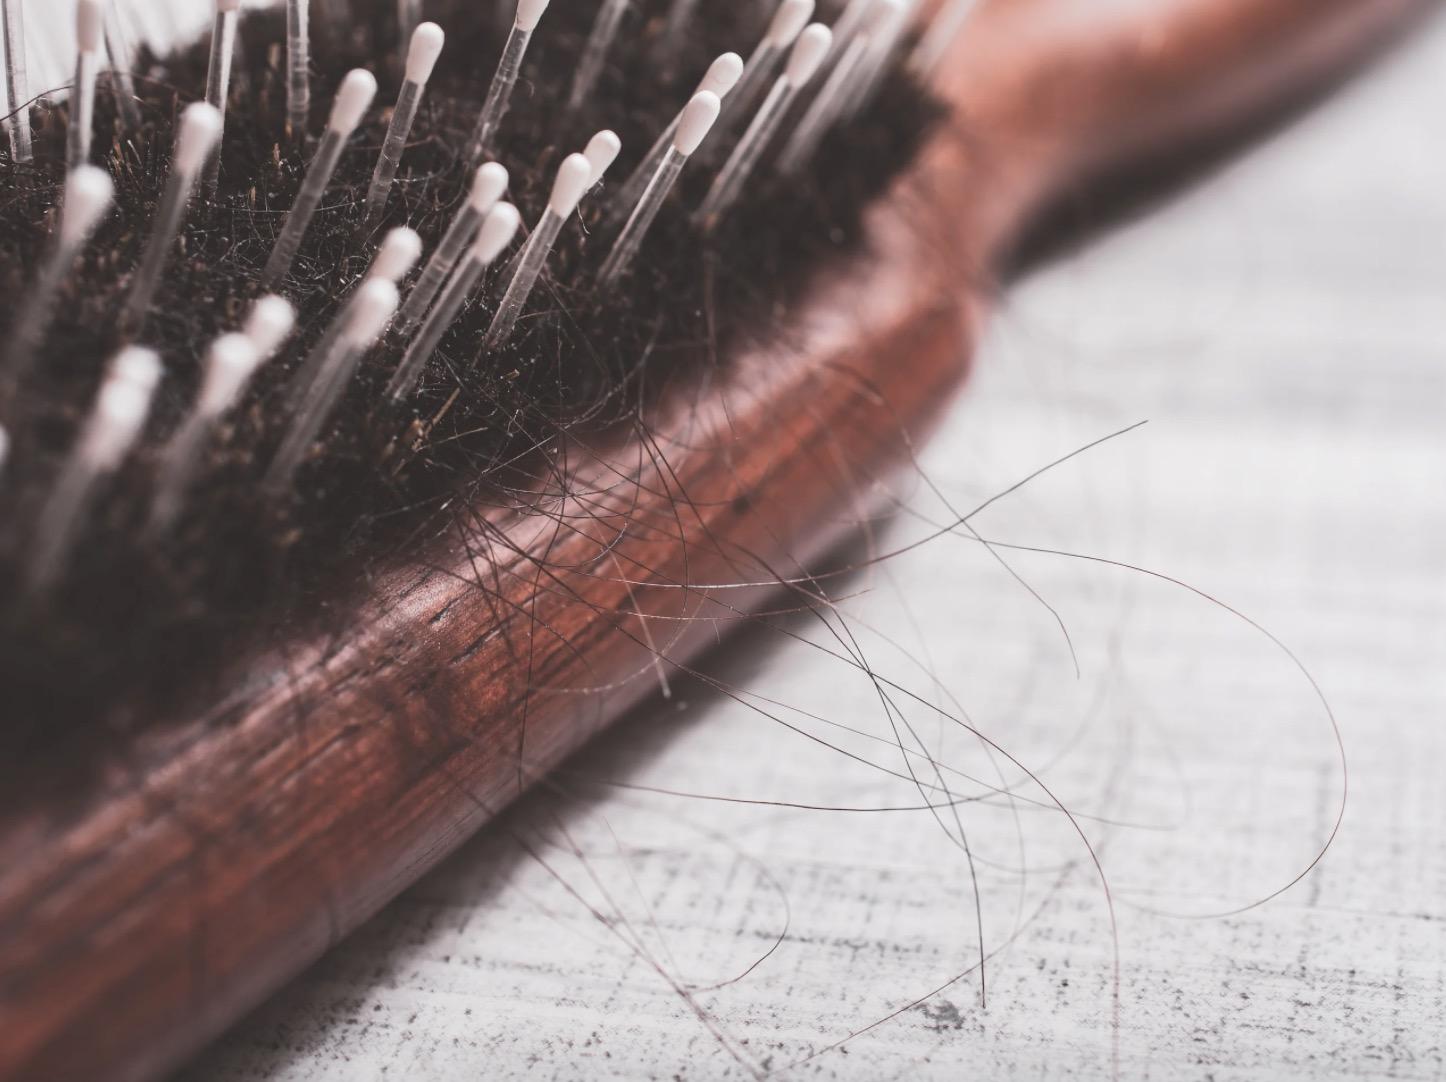 brosse-coiffure-cheveux-insolite-piloupilou